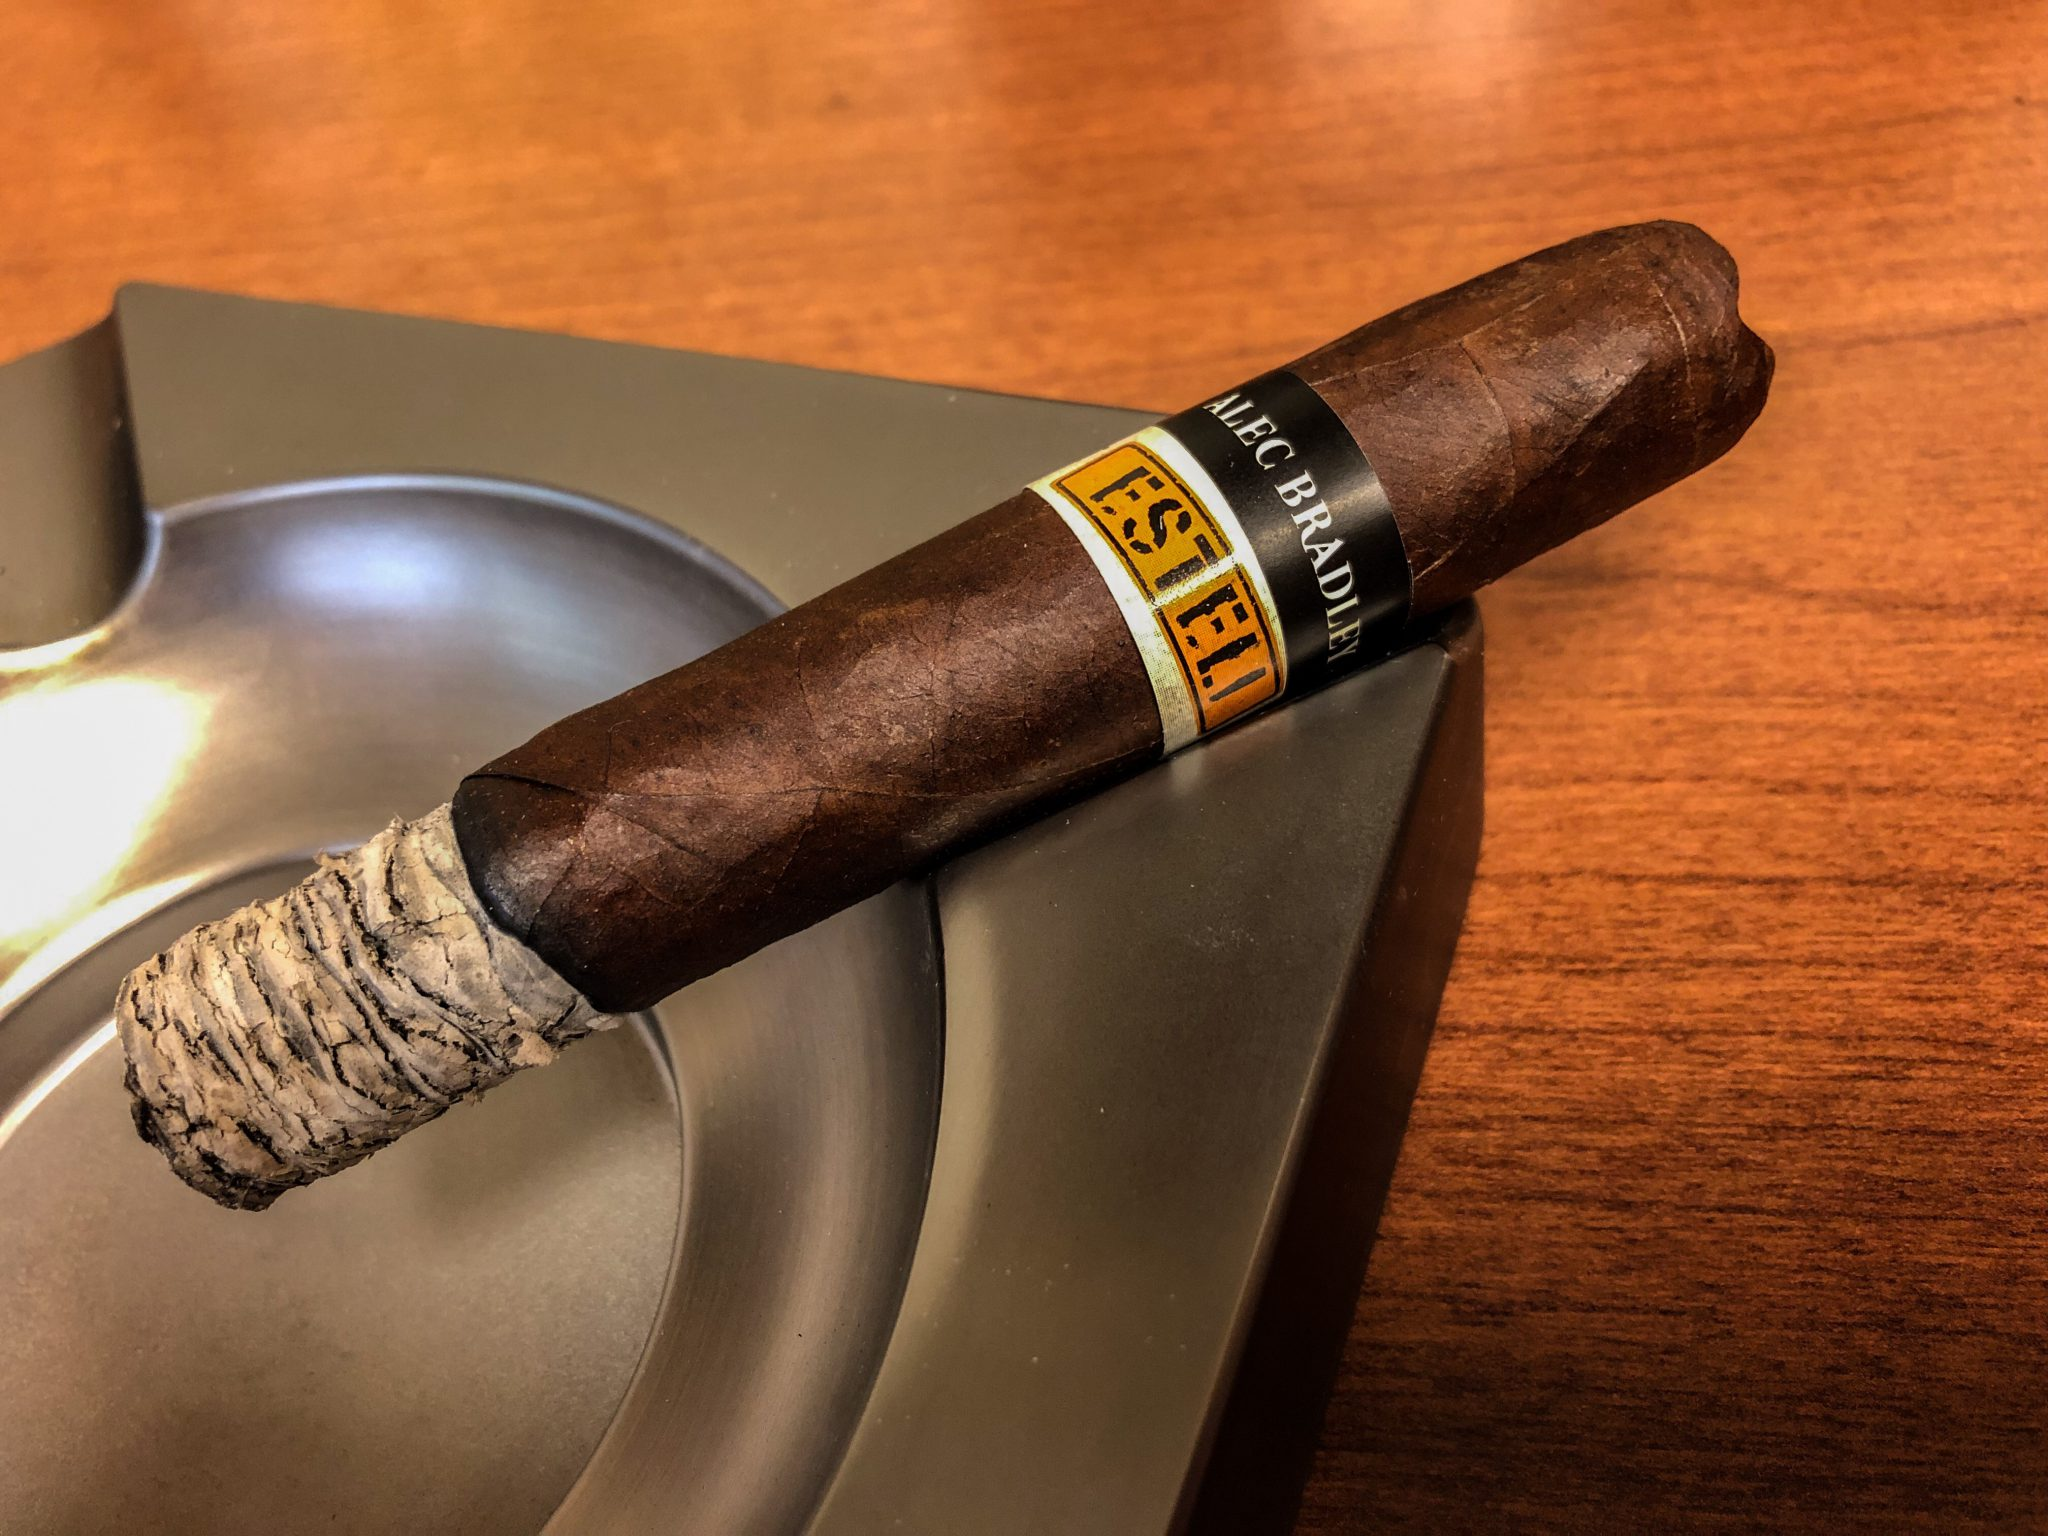 alec bradley cigars guide alec bradley black market esteli robusto cigar review by Jared Gulick